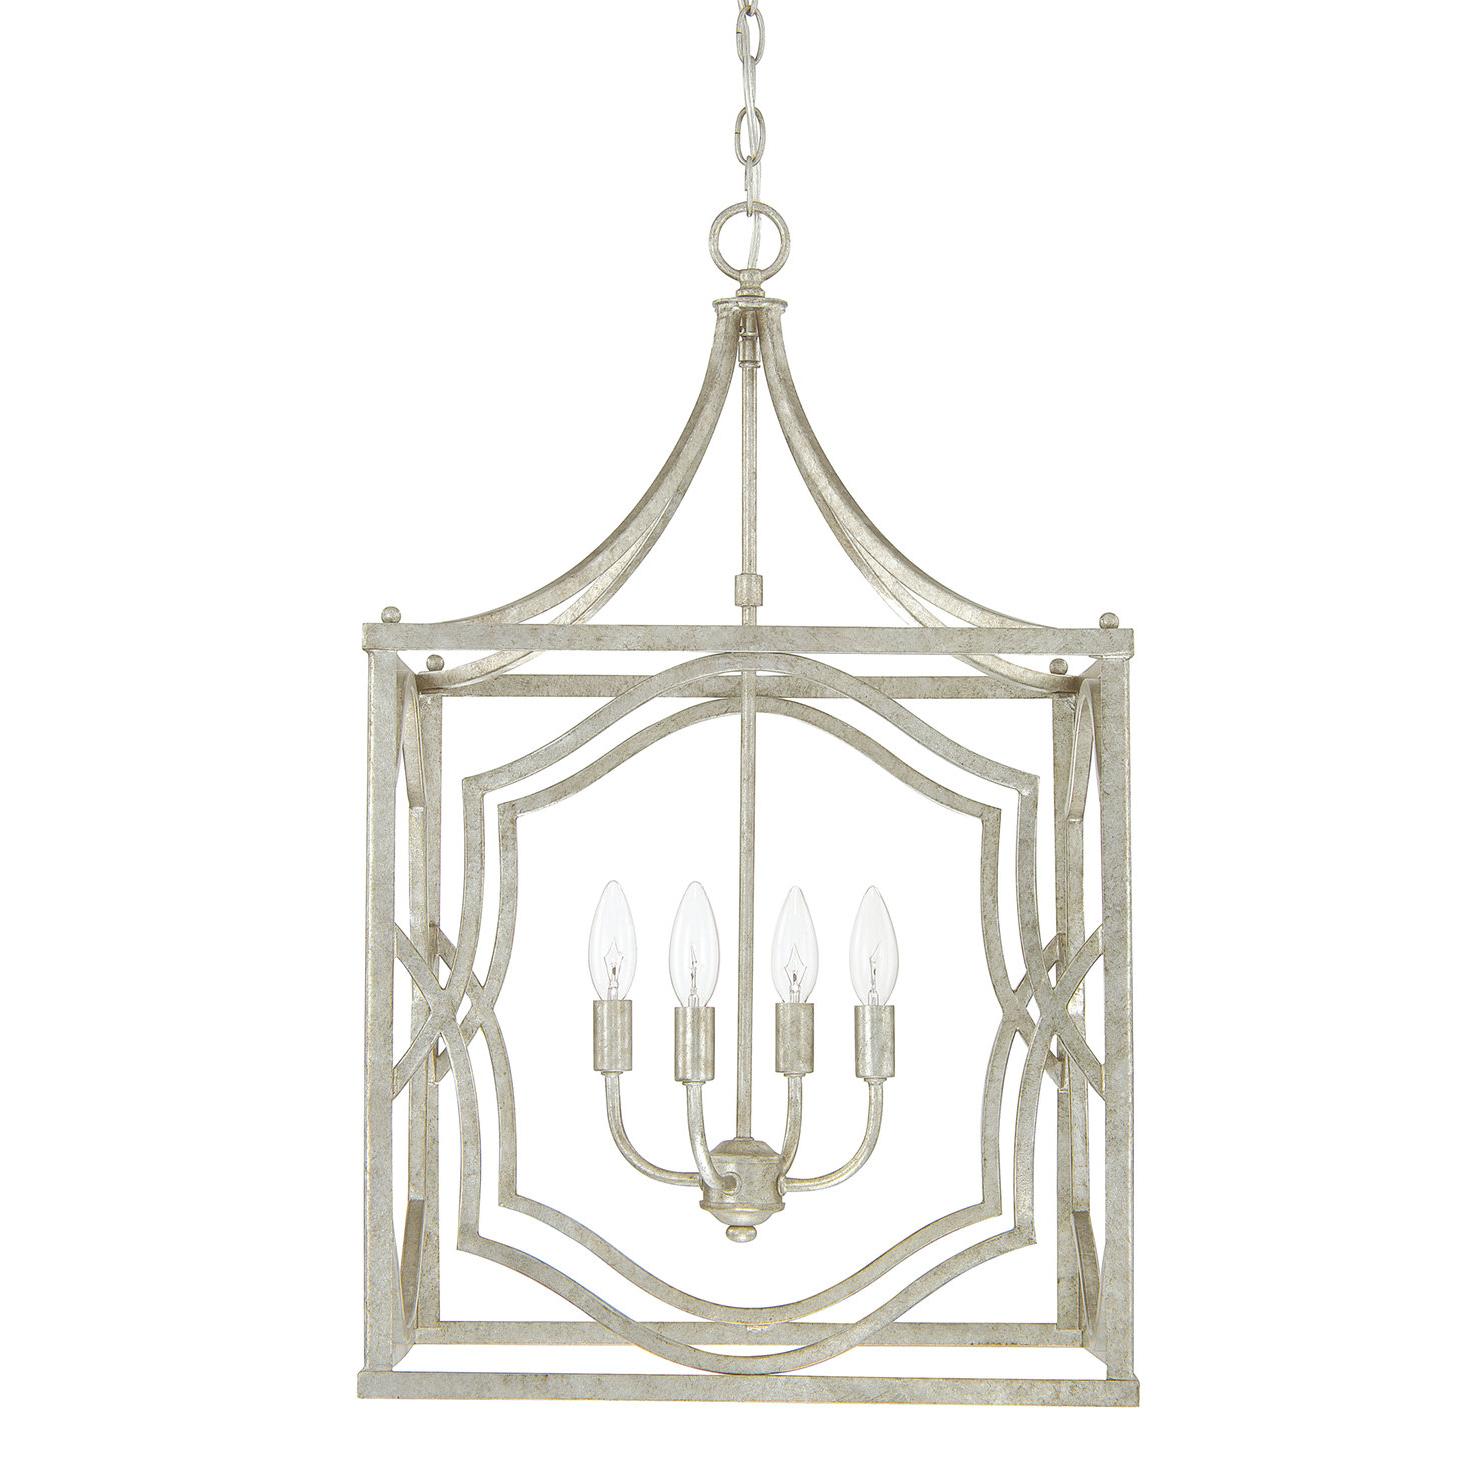 Destrey 4 Light Lantern Pendant Within 2019 Destrey 3 Light Lantern Square/rectangle Pendants (Gallery 5 of 20)